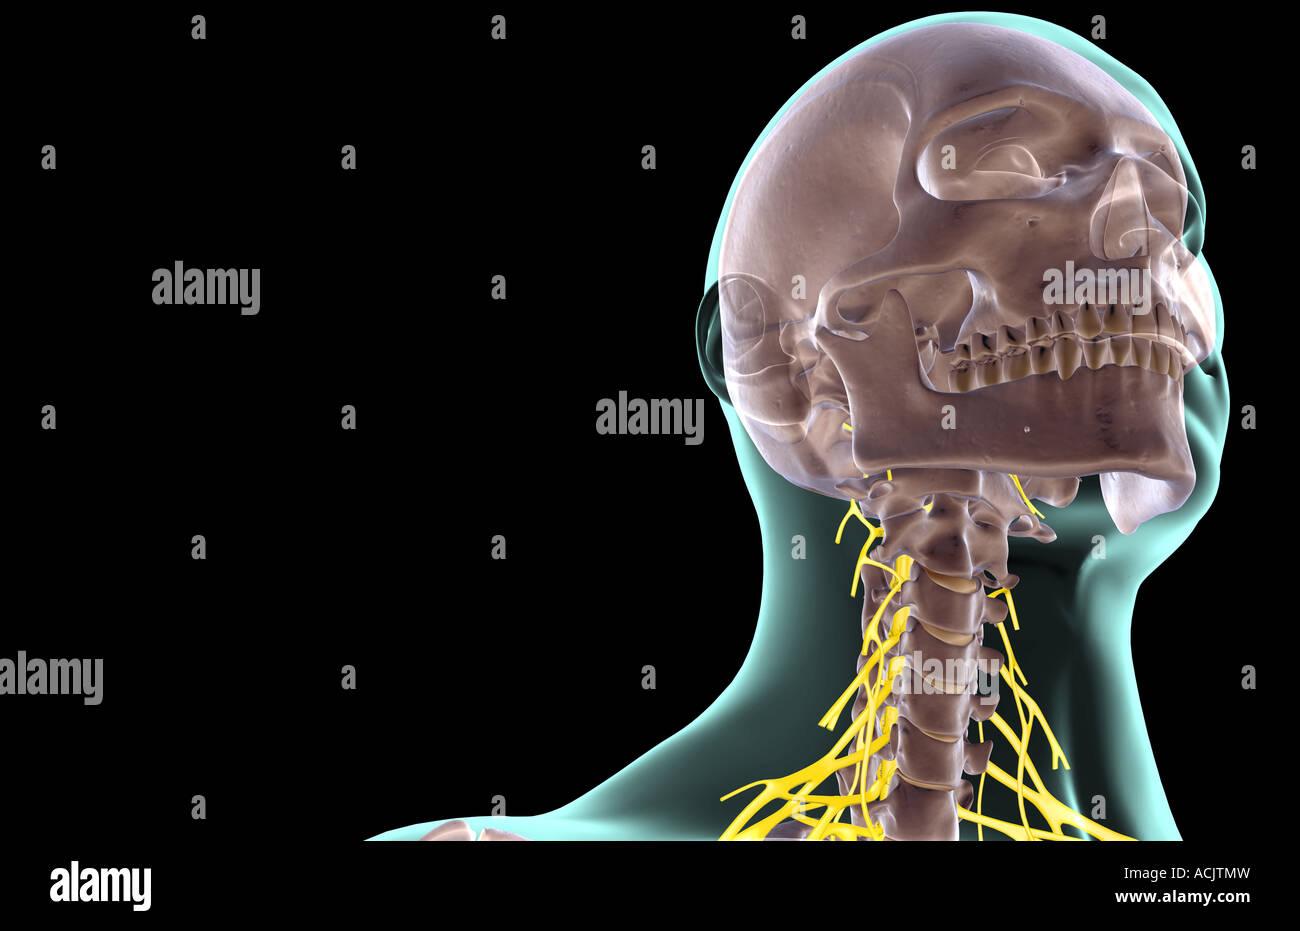 Die Nerven des Halses Stockfoto, Bild: 13173240 - Alamy